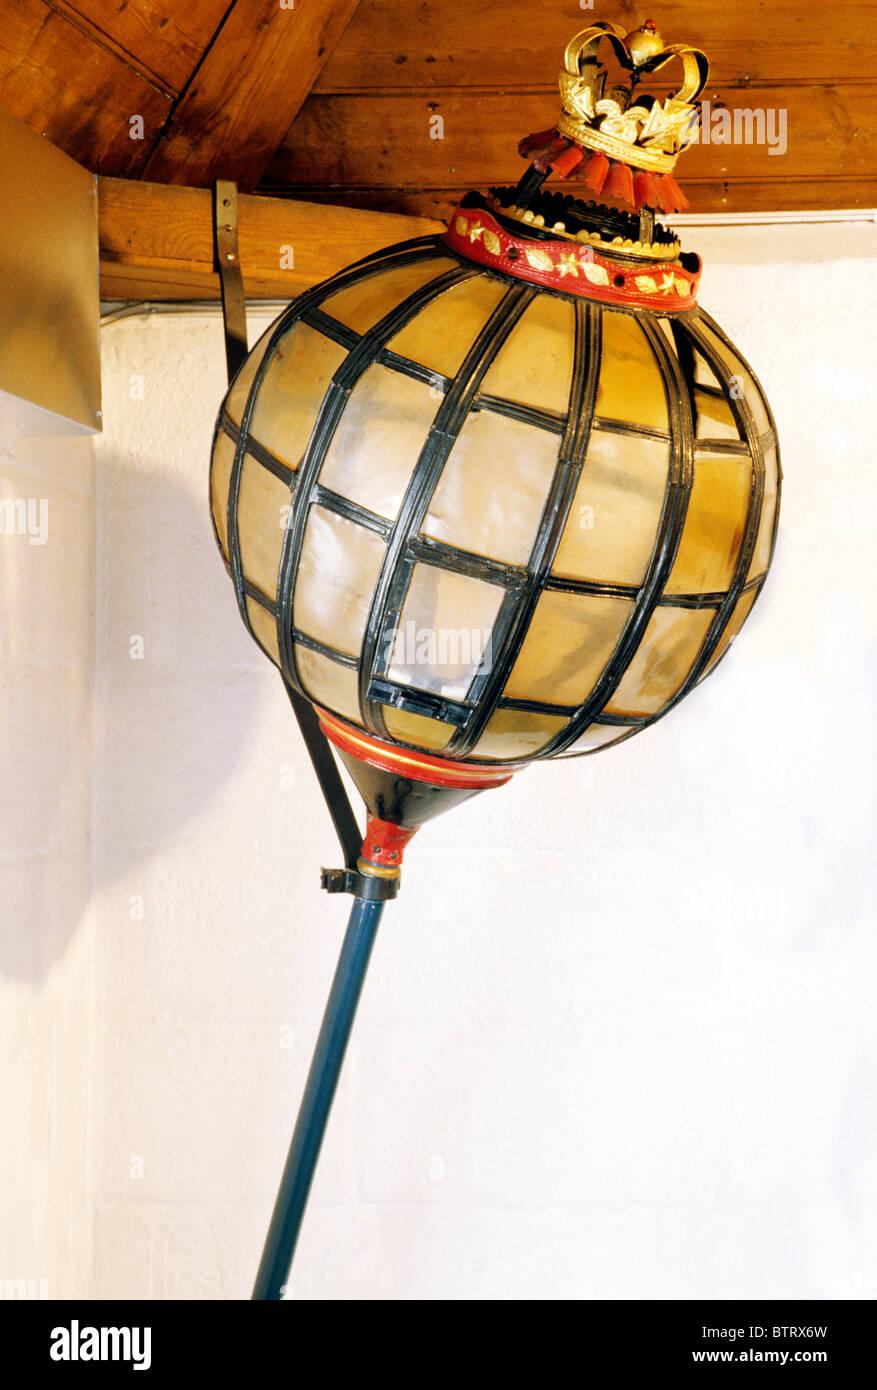 Chichester museum, Municipal Moon Mayor's Lantern, 17th century English oil mayoral lanterns Sussex England - Stock Image